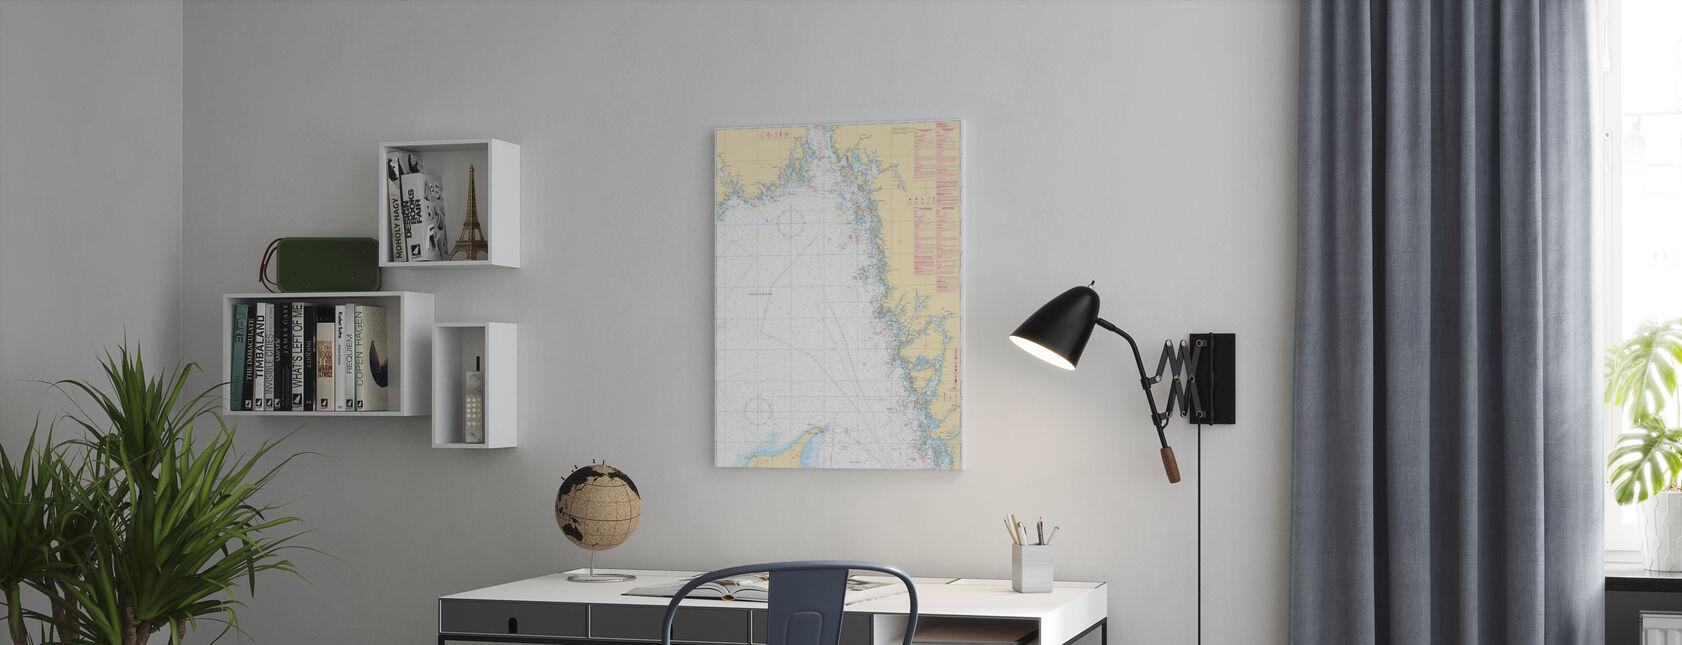 Havsdiagram 93 - Skagerrak - Canvastavla - Kontor